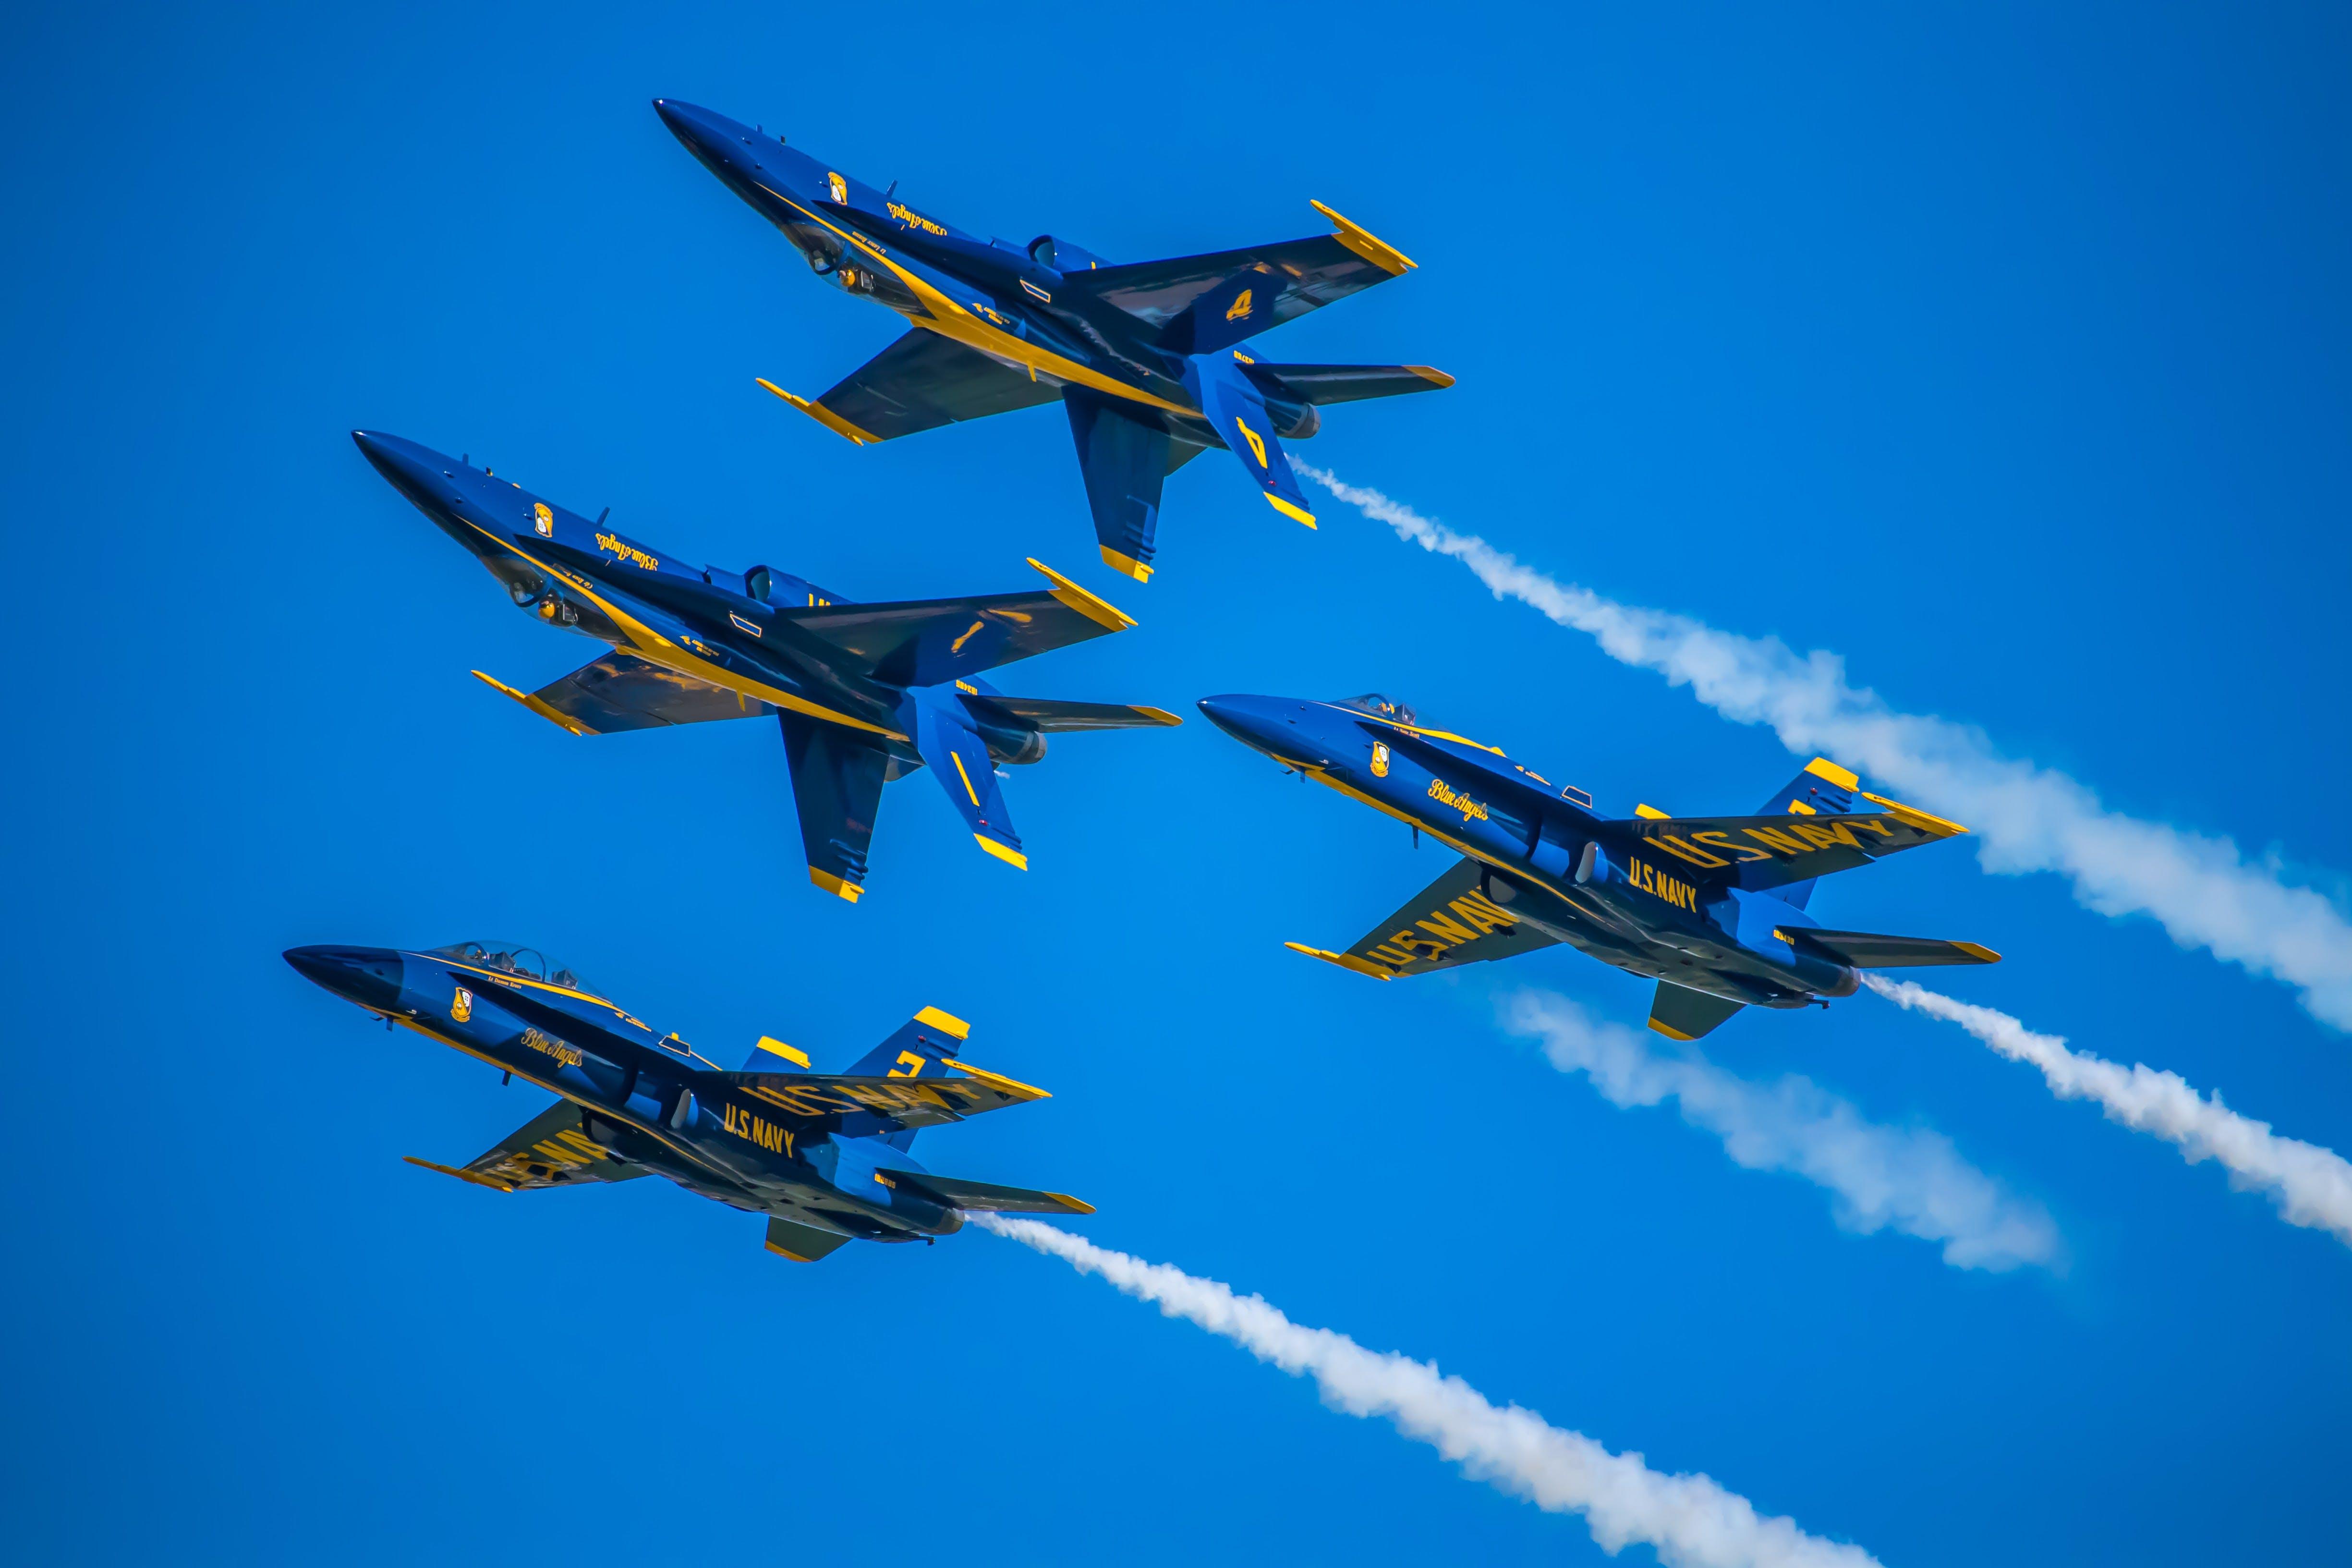 Kostenloses Stock Foto zu flug, himmel, fliegen, blauer himmel